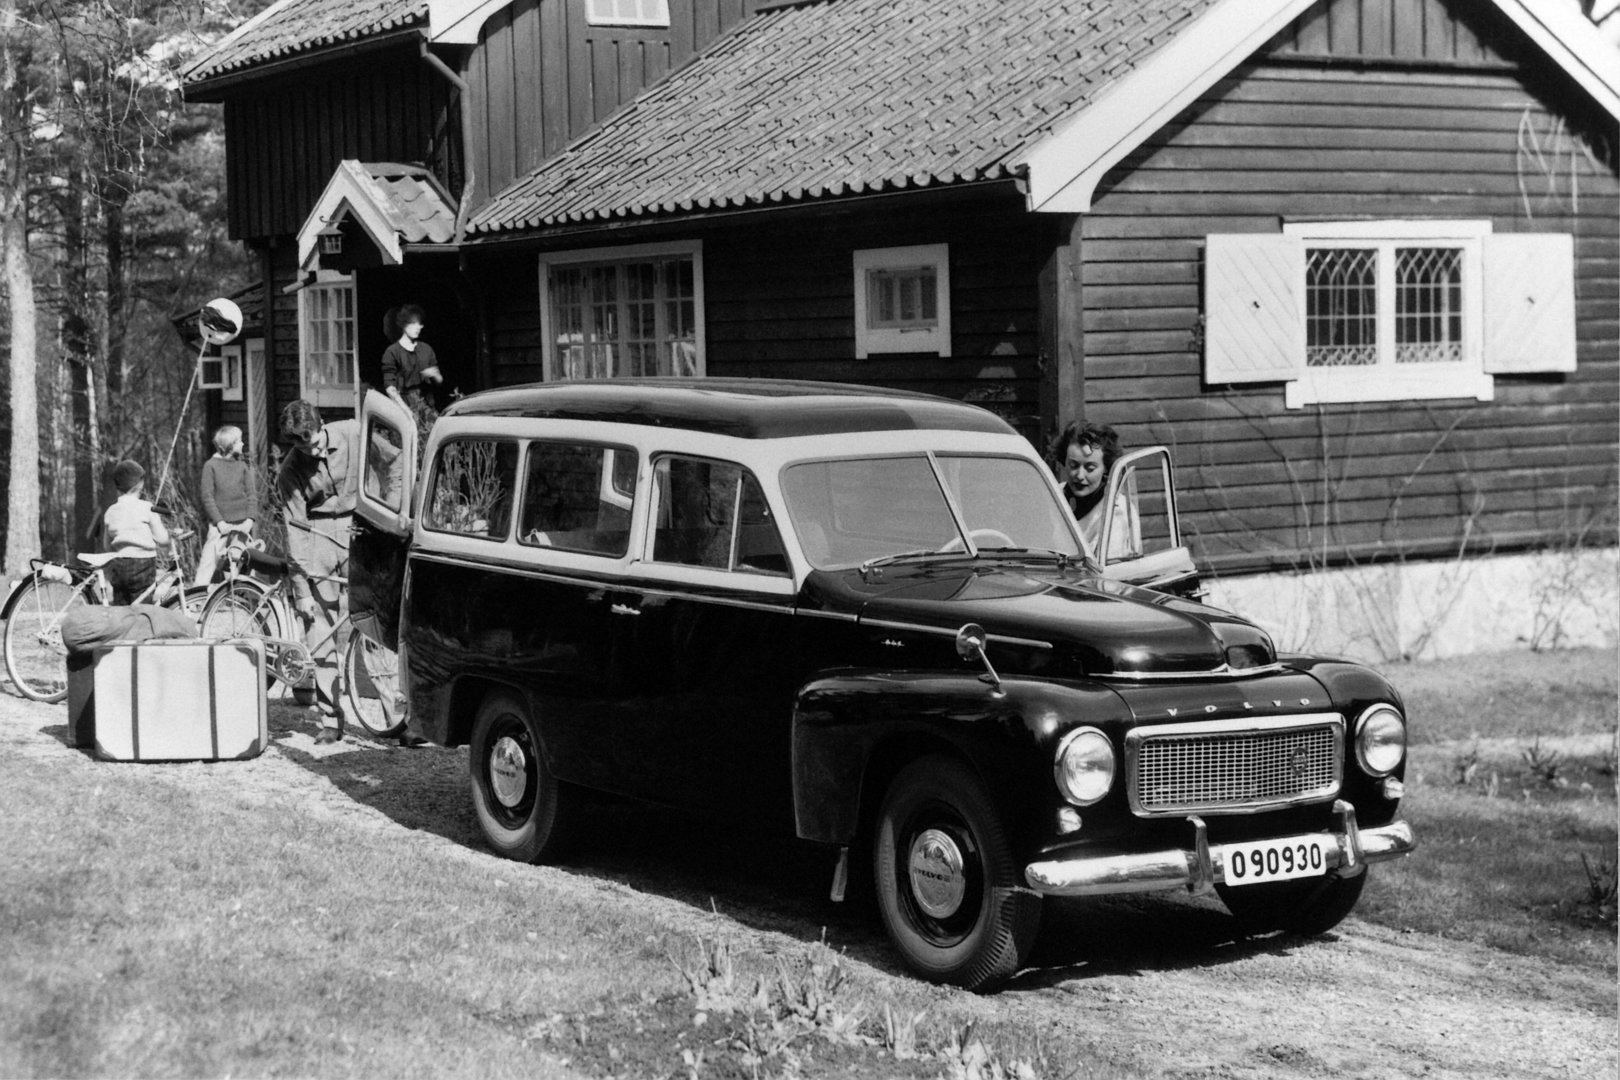 Volvo PV 445 PH 1958